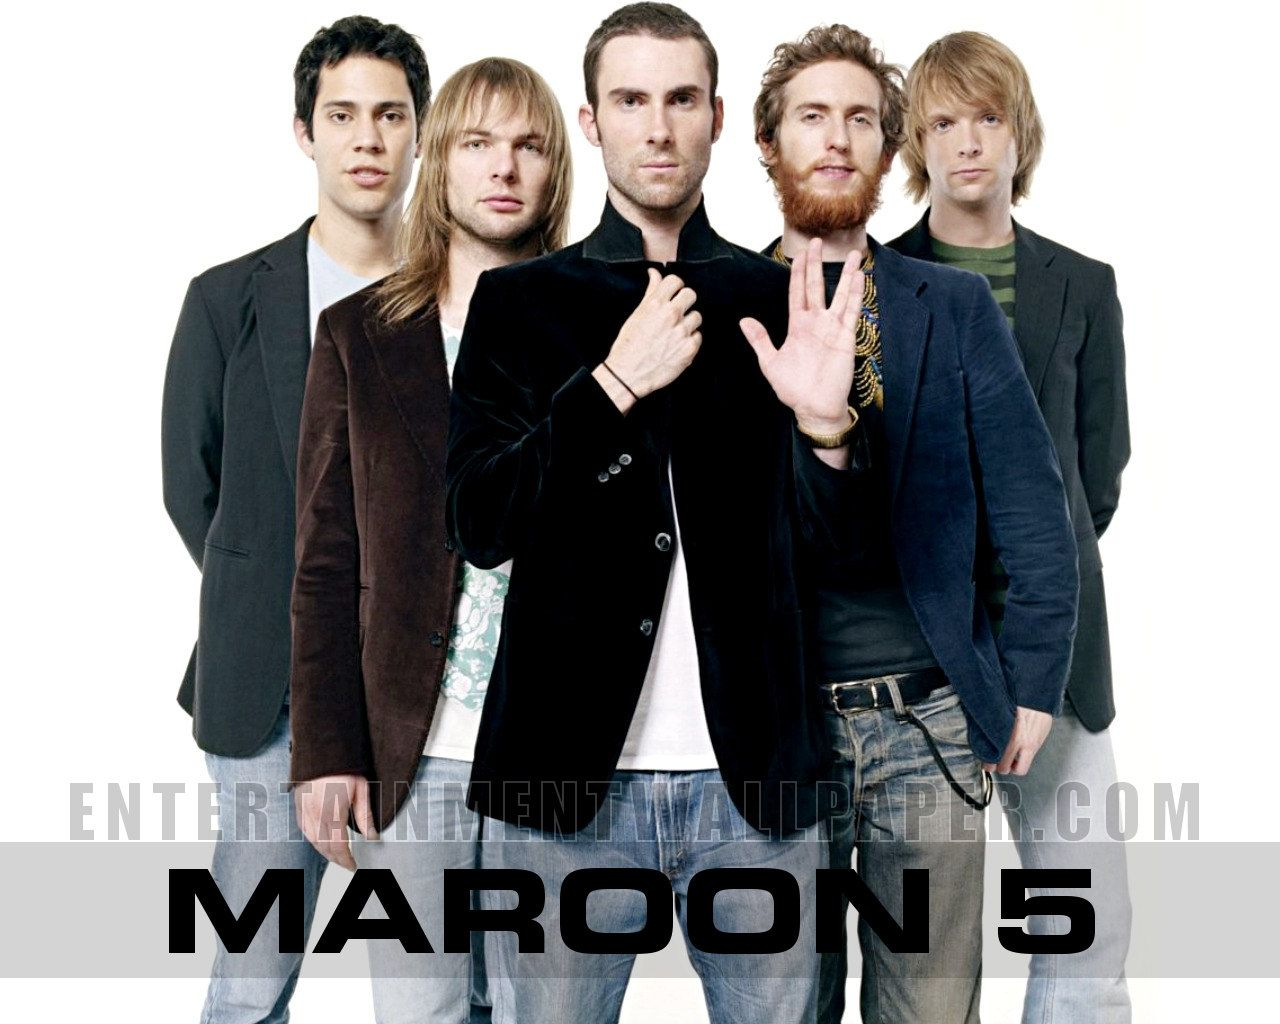 Maroon 5 3 Maroon 5 Maroon Celebrities